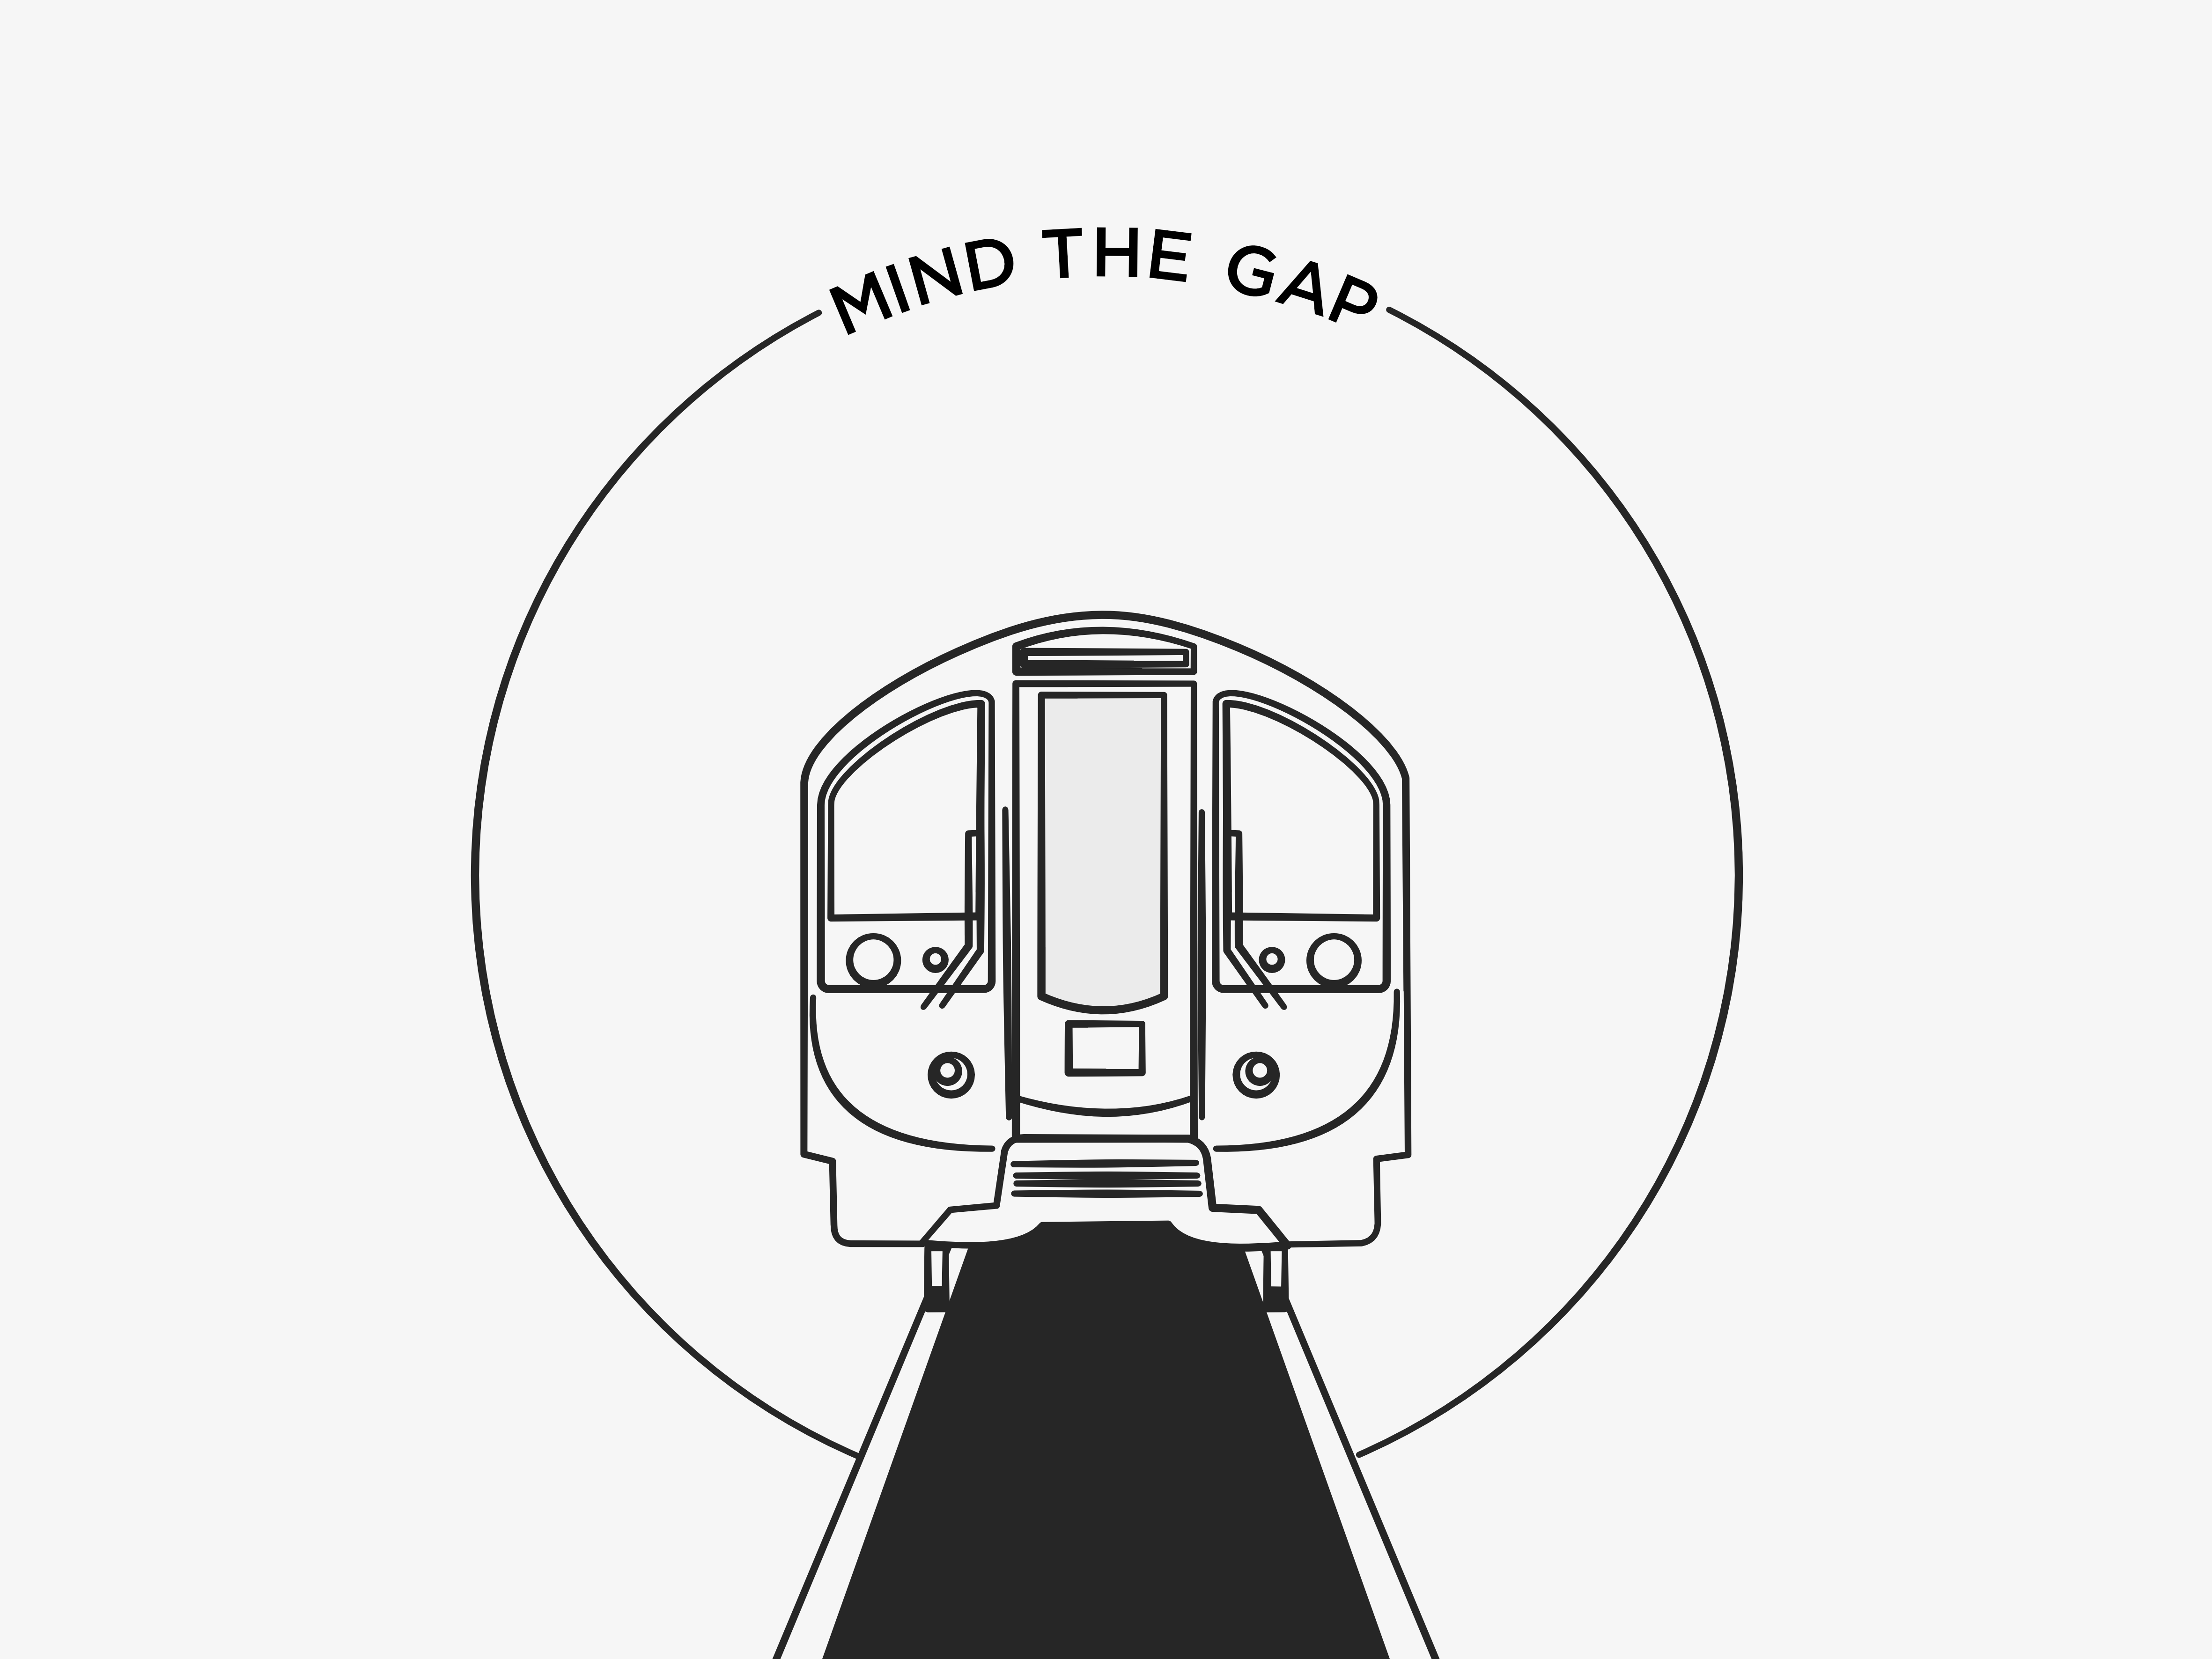 london underground tube mind the gap illustration